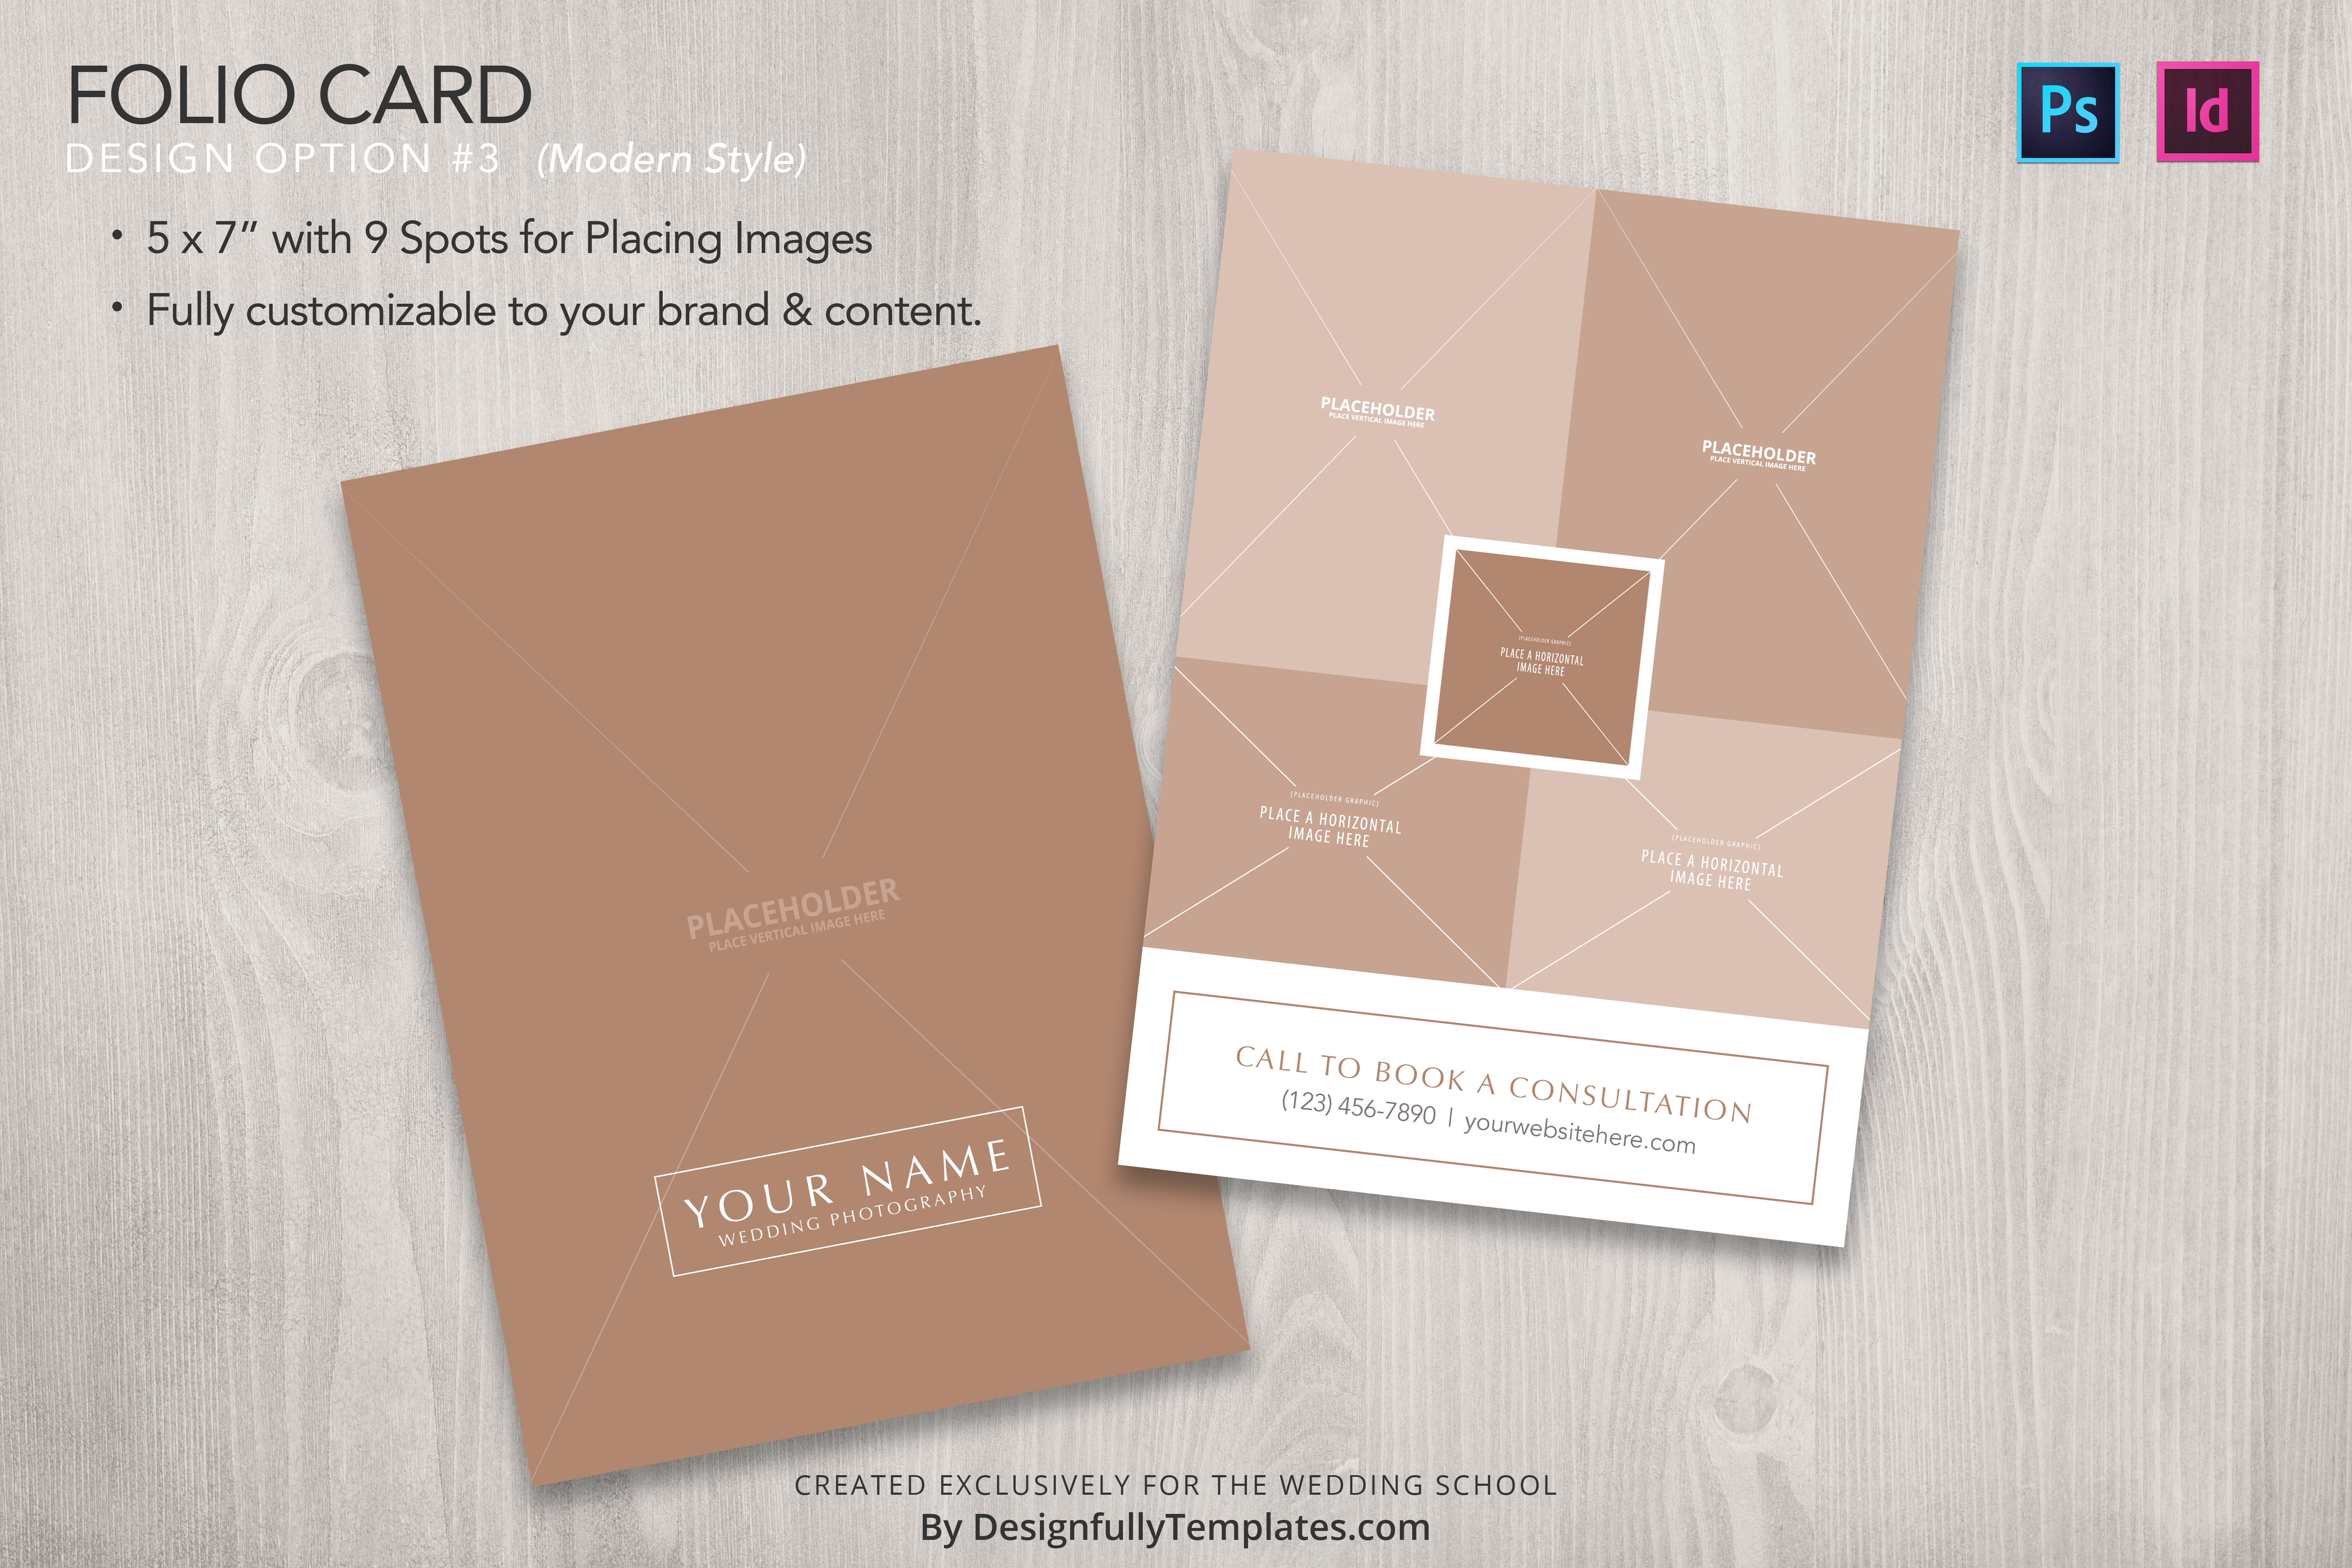 templates for wedding photographers bundle the wedding school